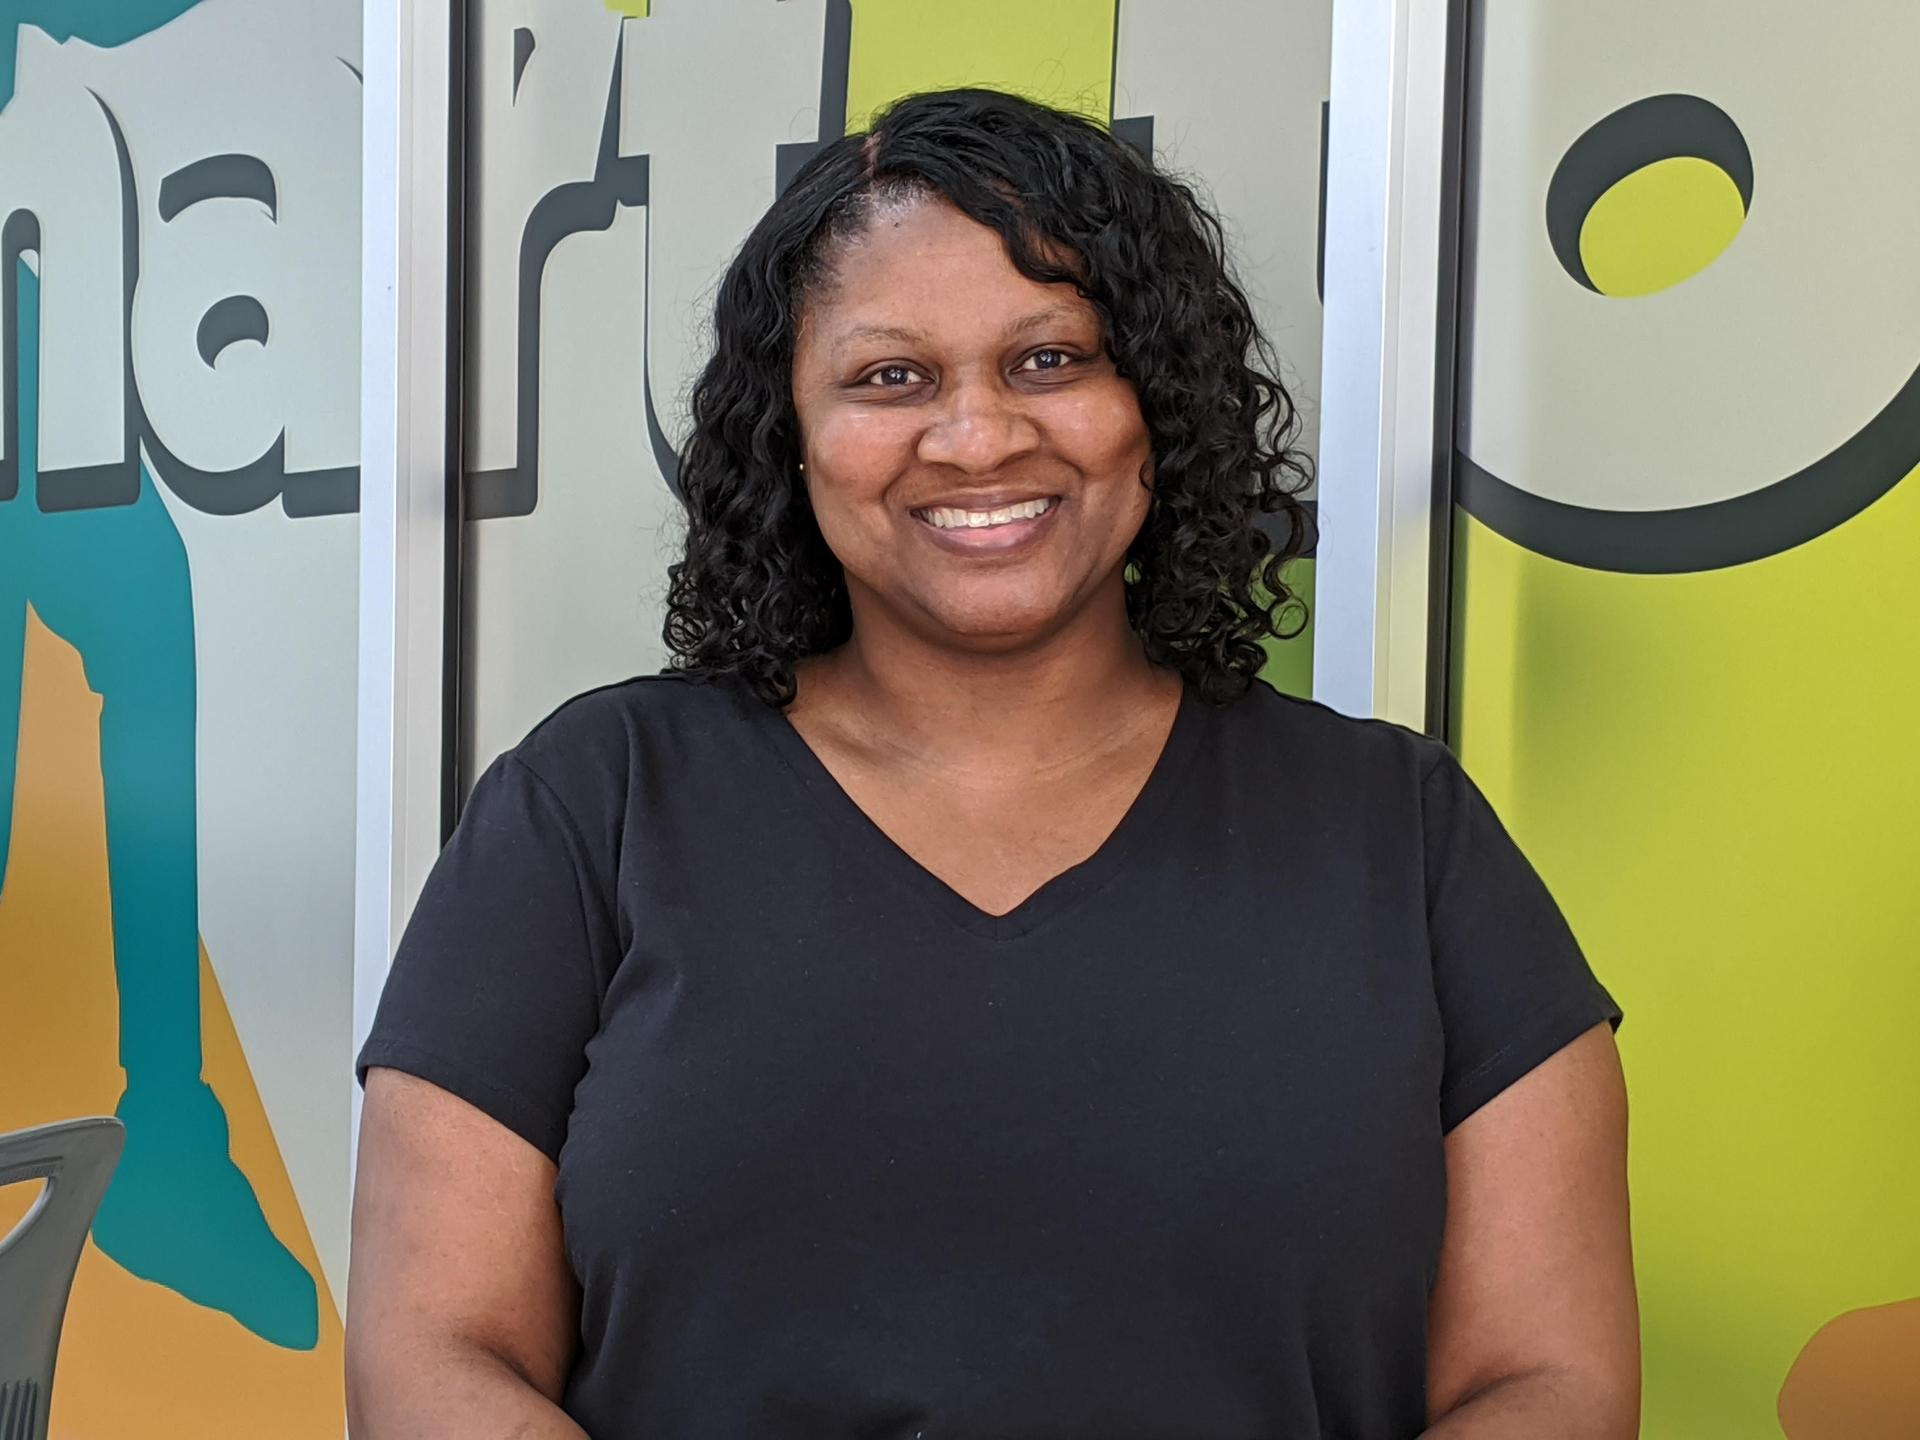 Ms. Johnson - Teacher